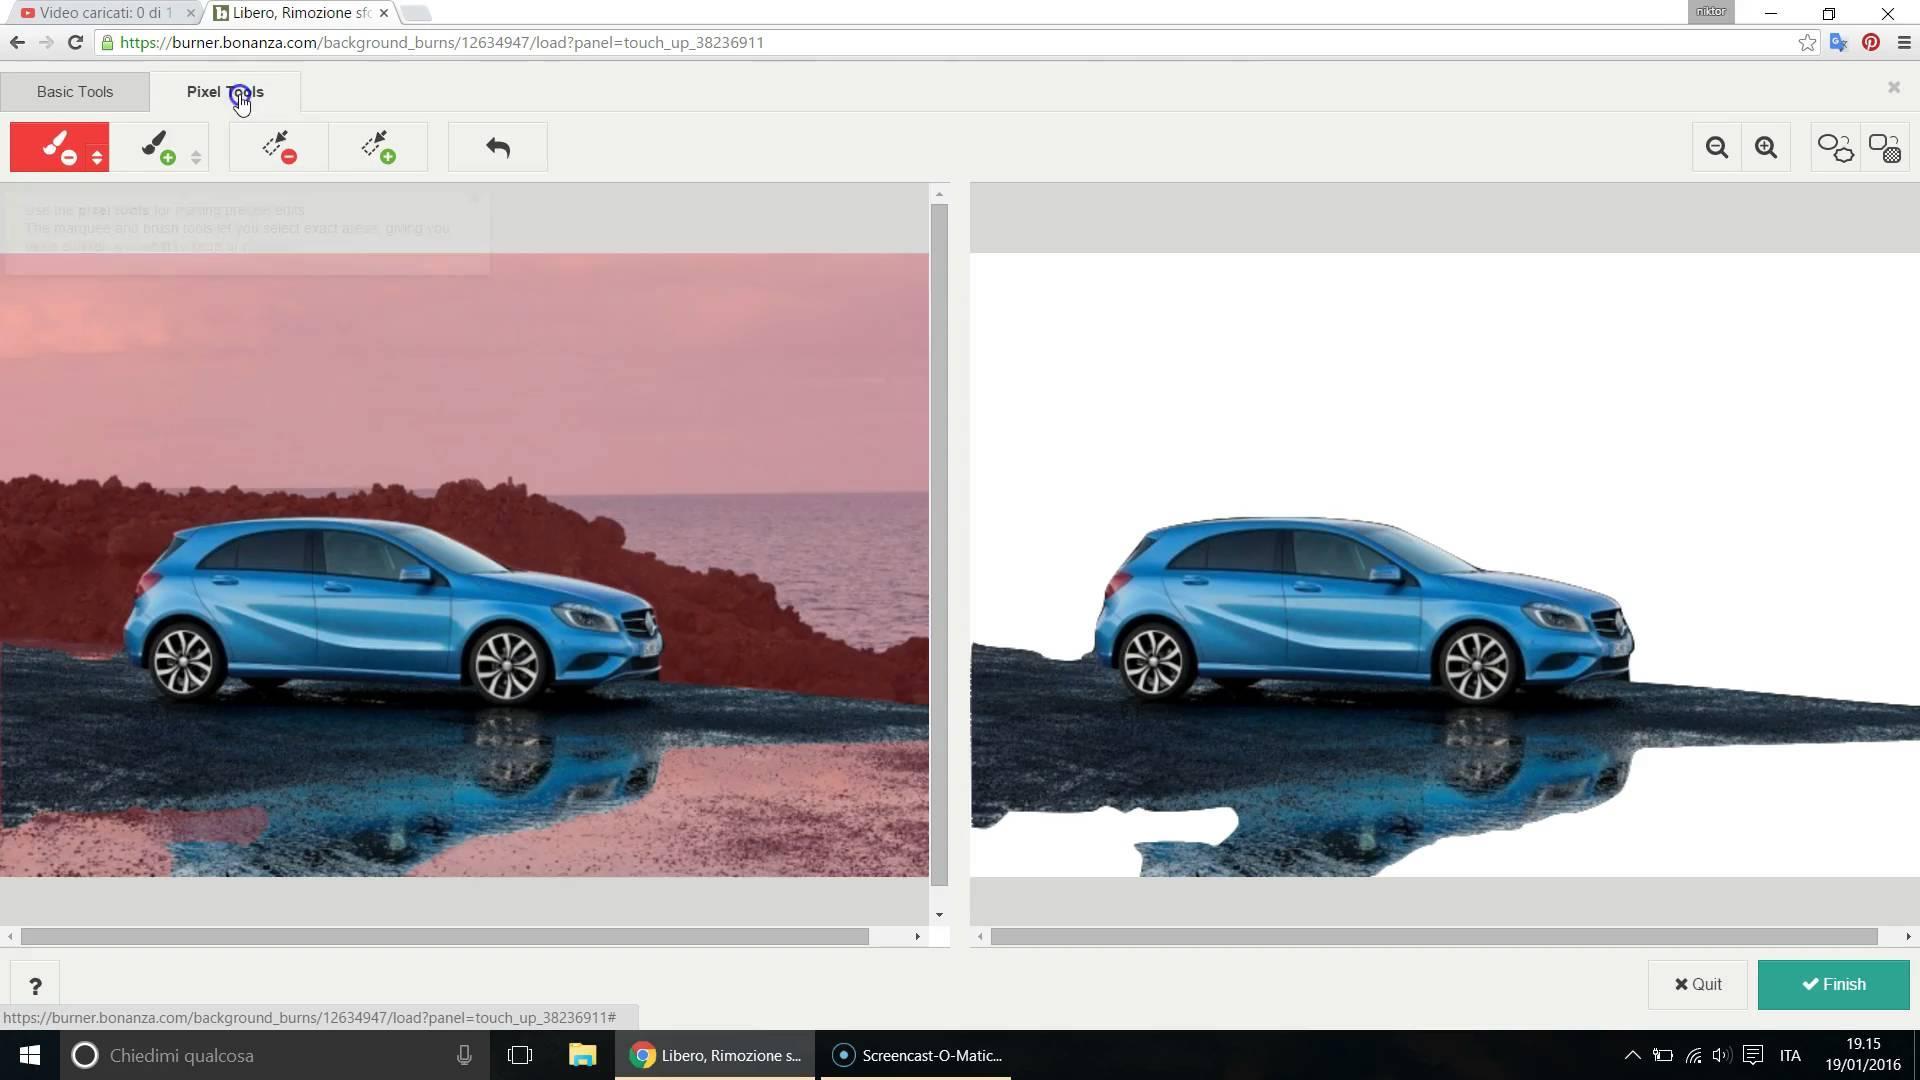 Background Bruner: Как убрать фон с картинки онлайн